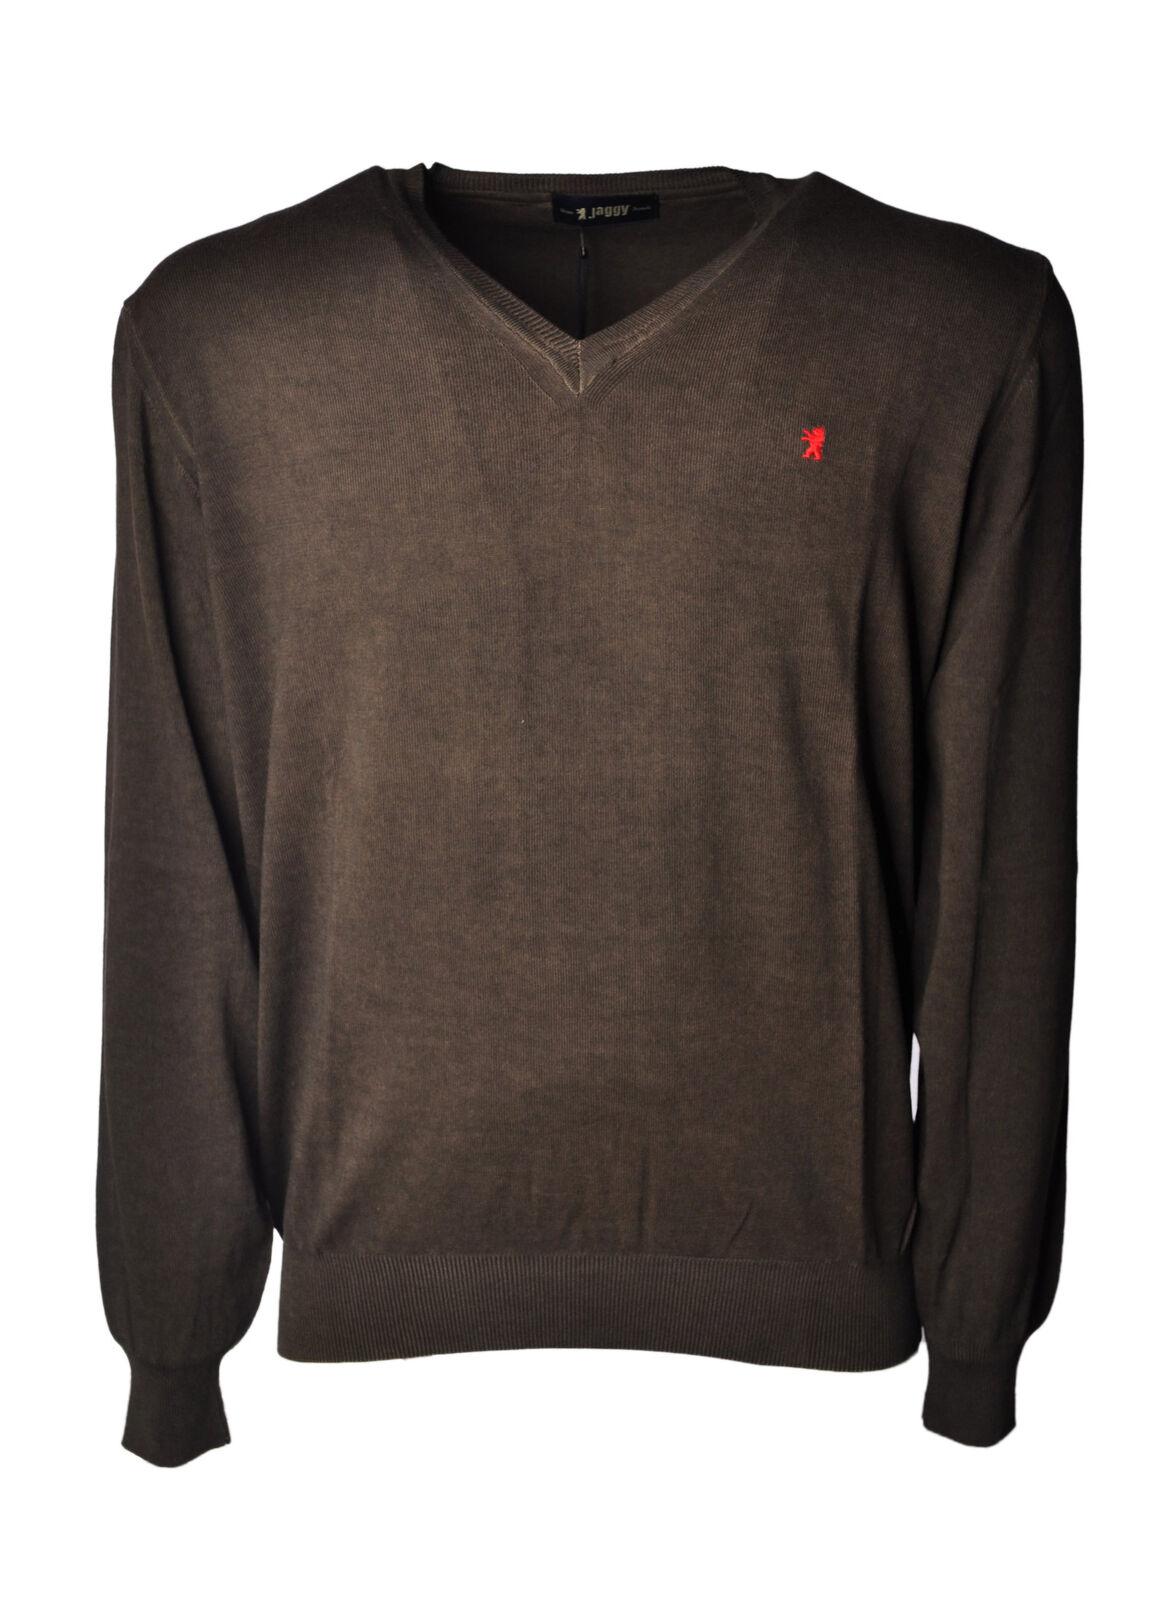 Jaggy  -  Sweaters - Male - Braun - 4631422A182151